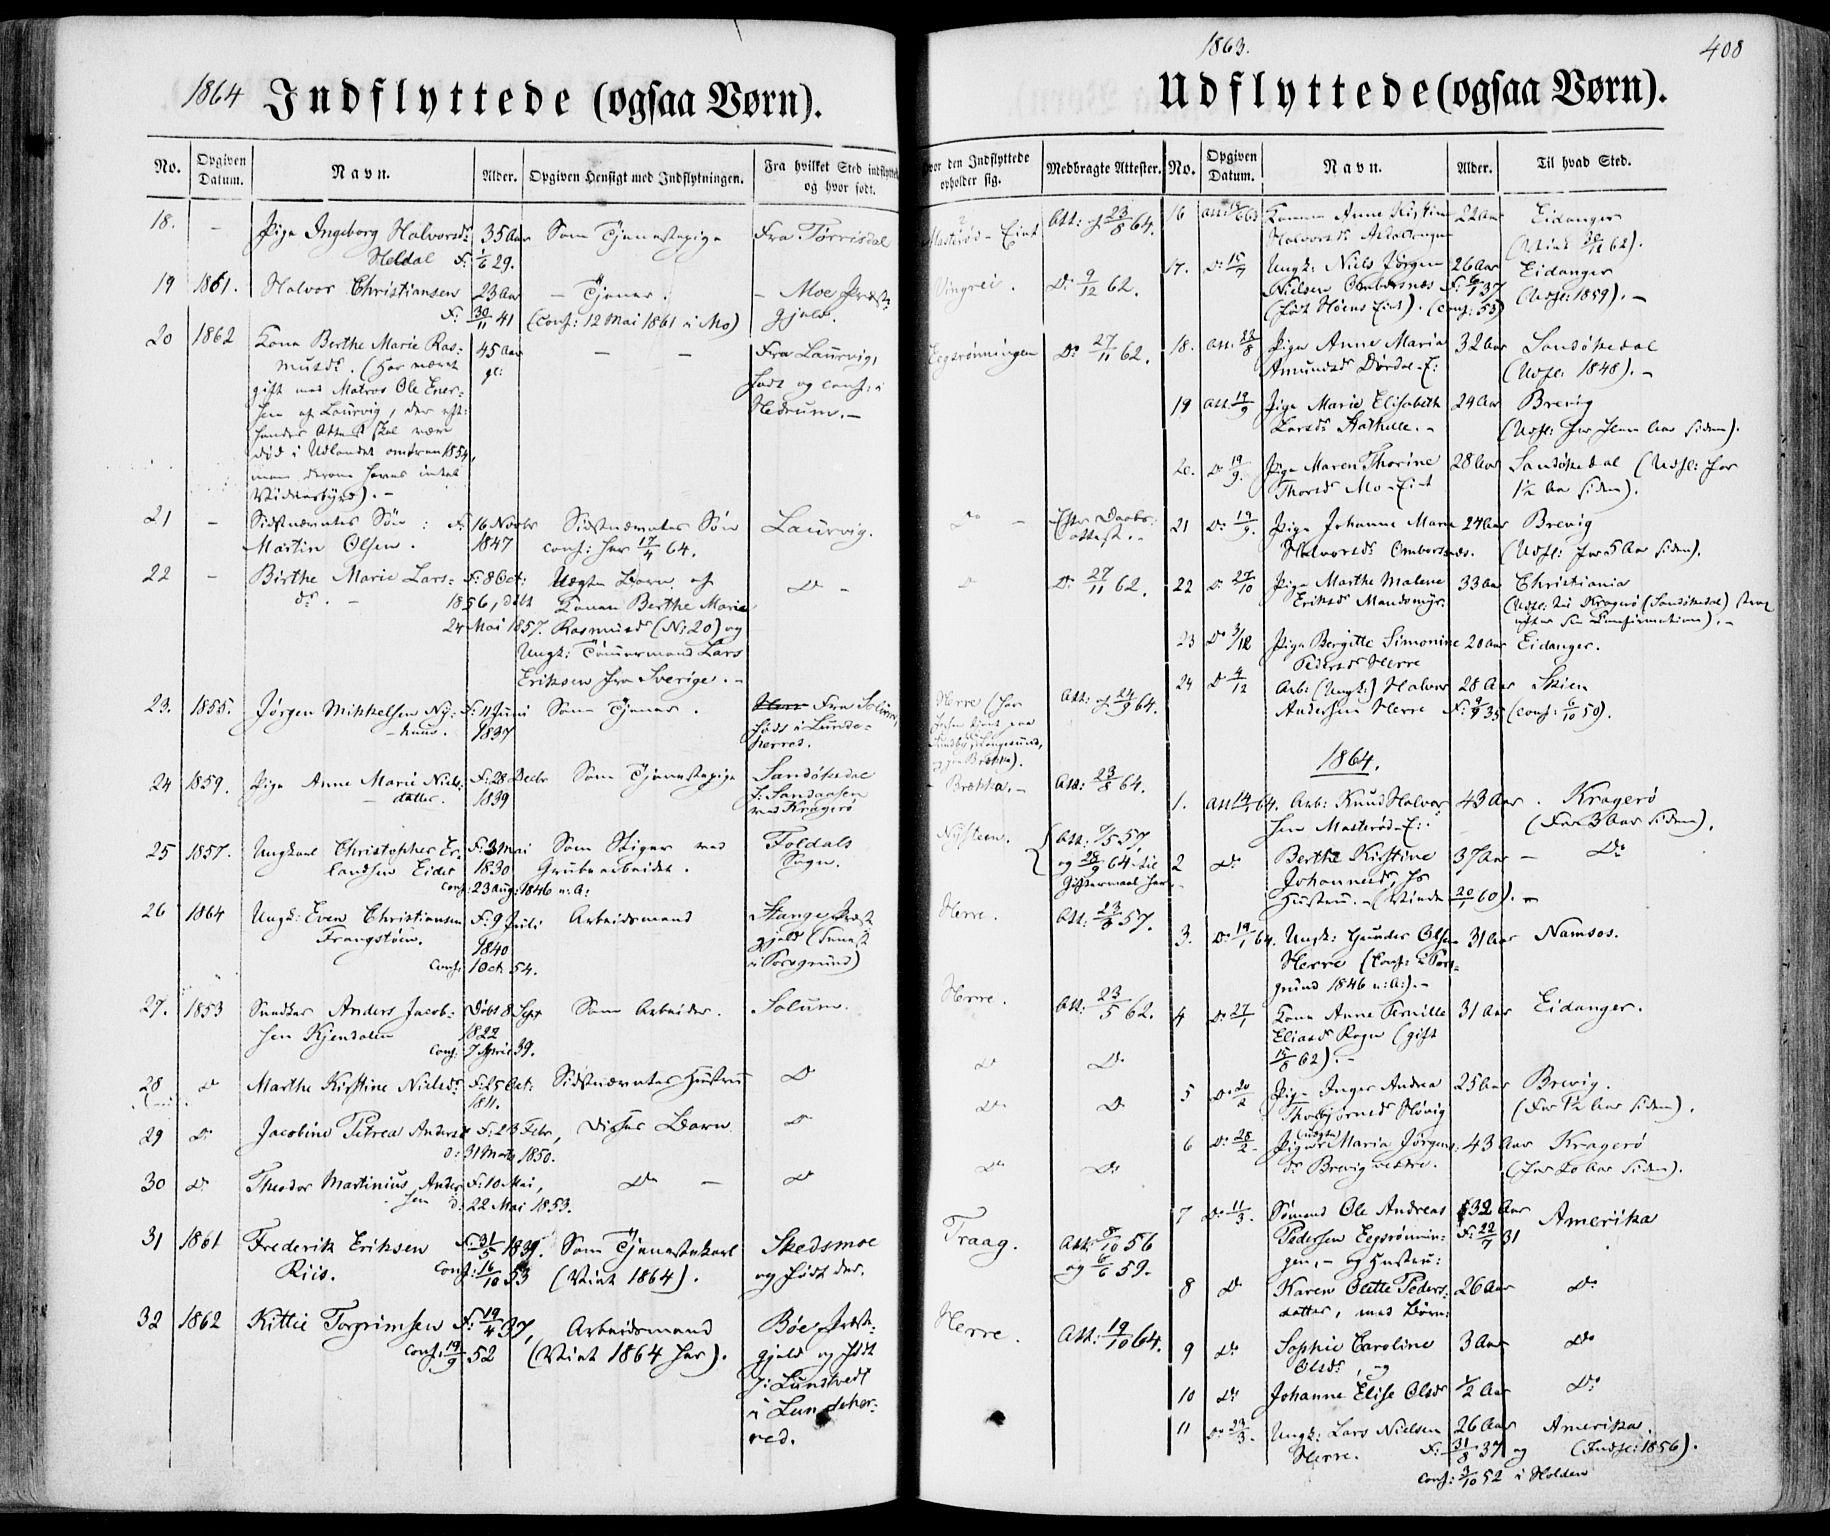 SAKO, Bamble kirkebøker, F/Fa/L0005: Ministerialbok nr. I 5, 1854-1869, s. 408